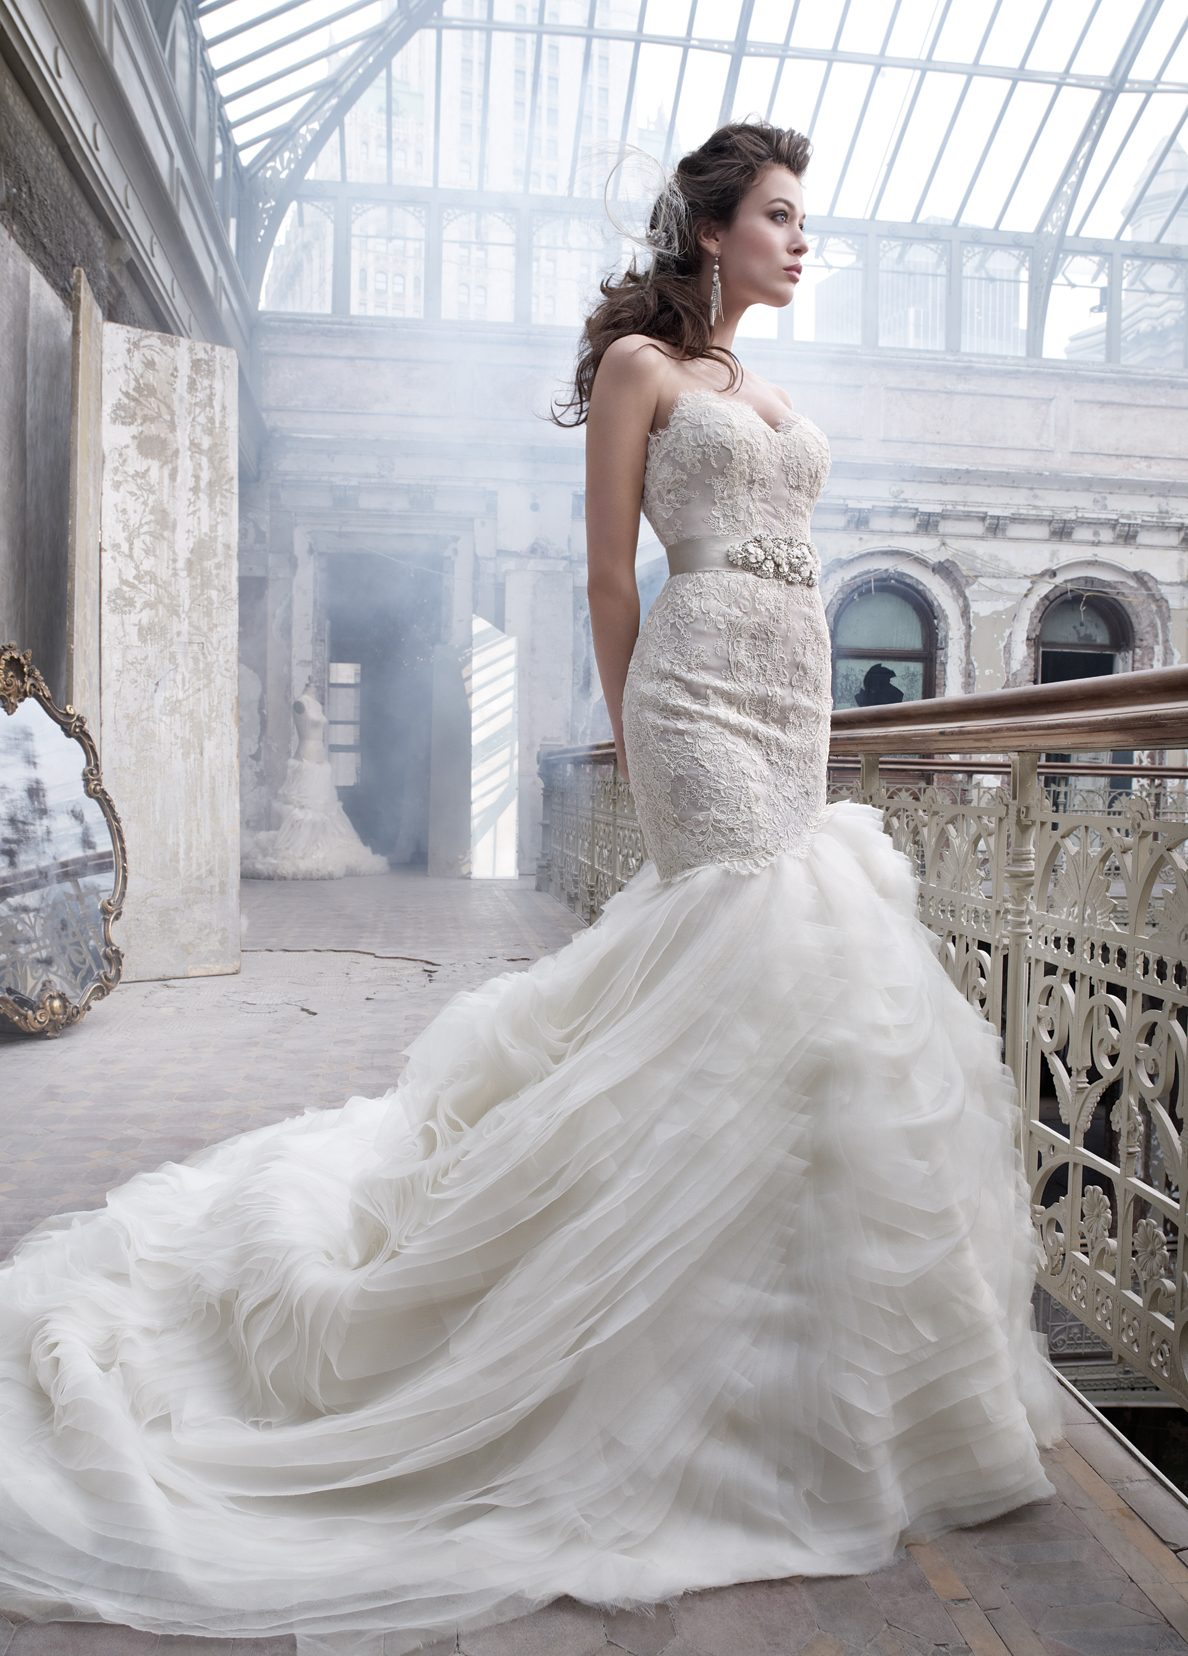 dina alonzi bridal wedding dress attire in